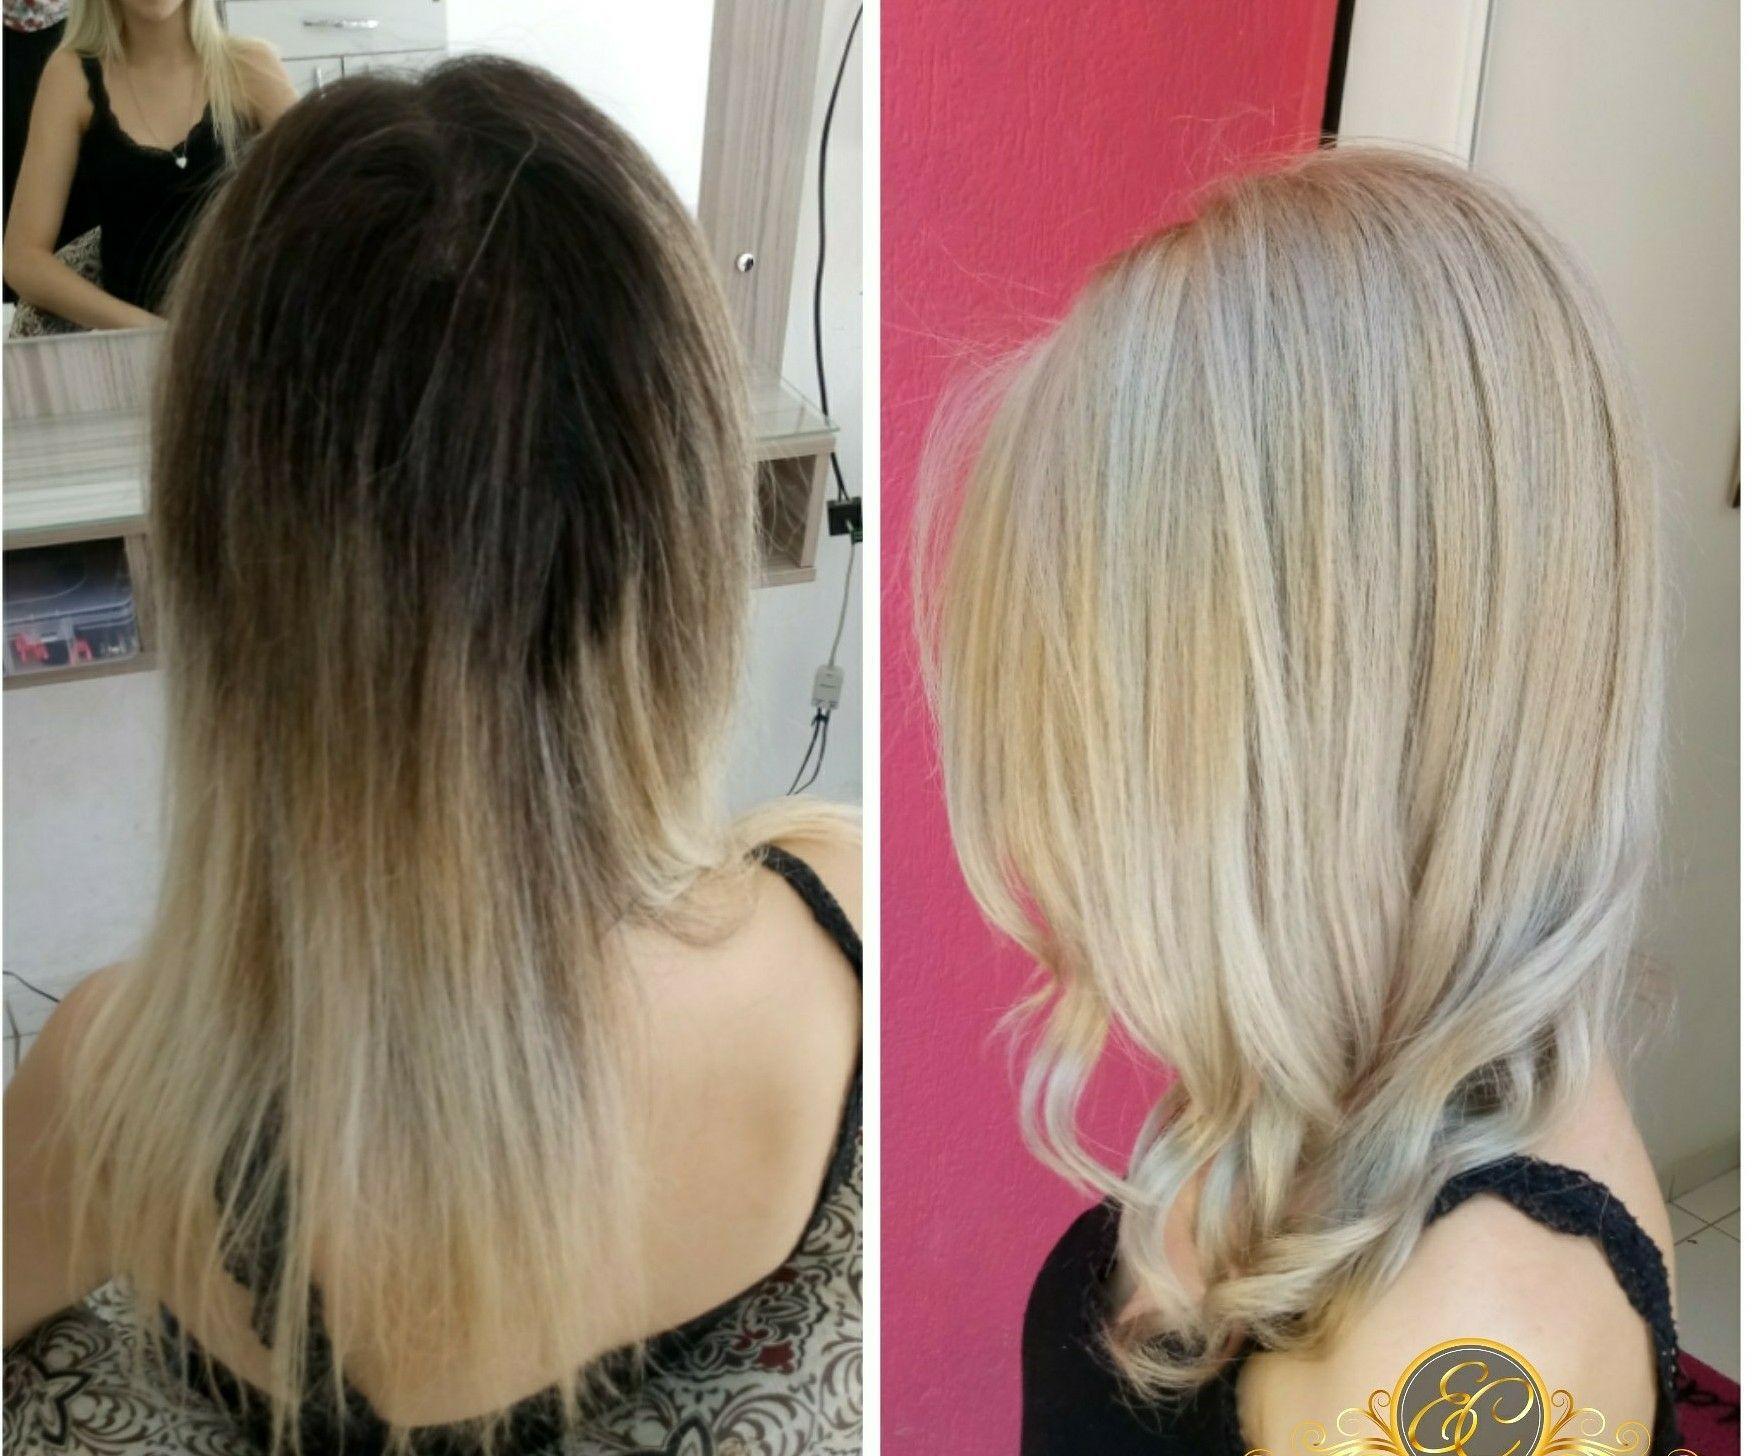 Descoloração Global !loiro BEIGE#loirobeige #descoloraçaoglobal# cabelo cabeleireiro(a) stylist / visagista